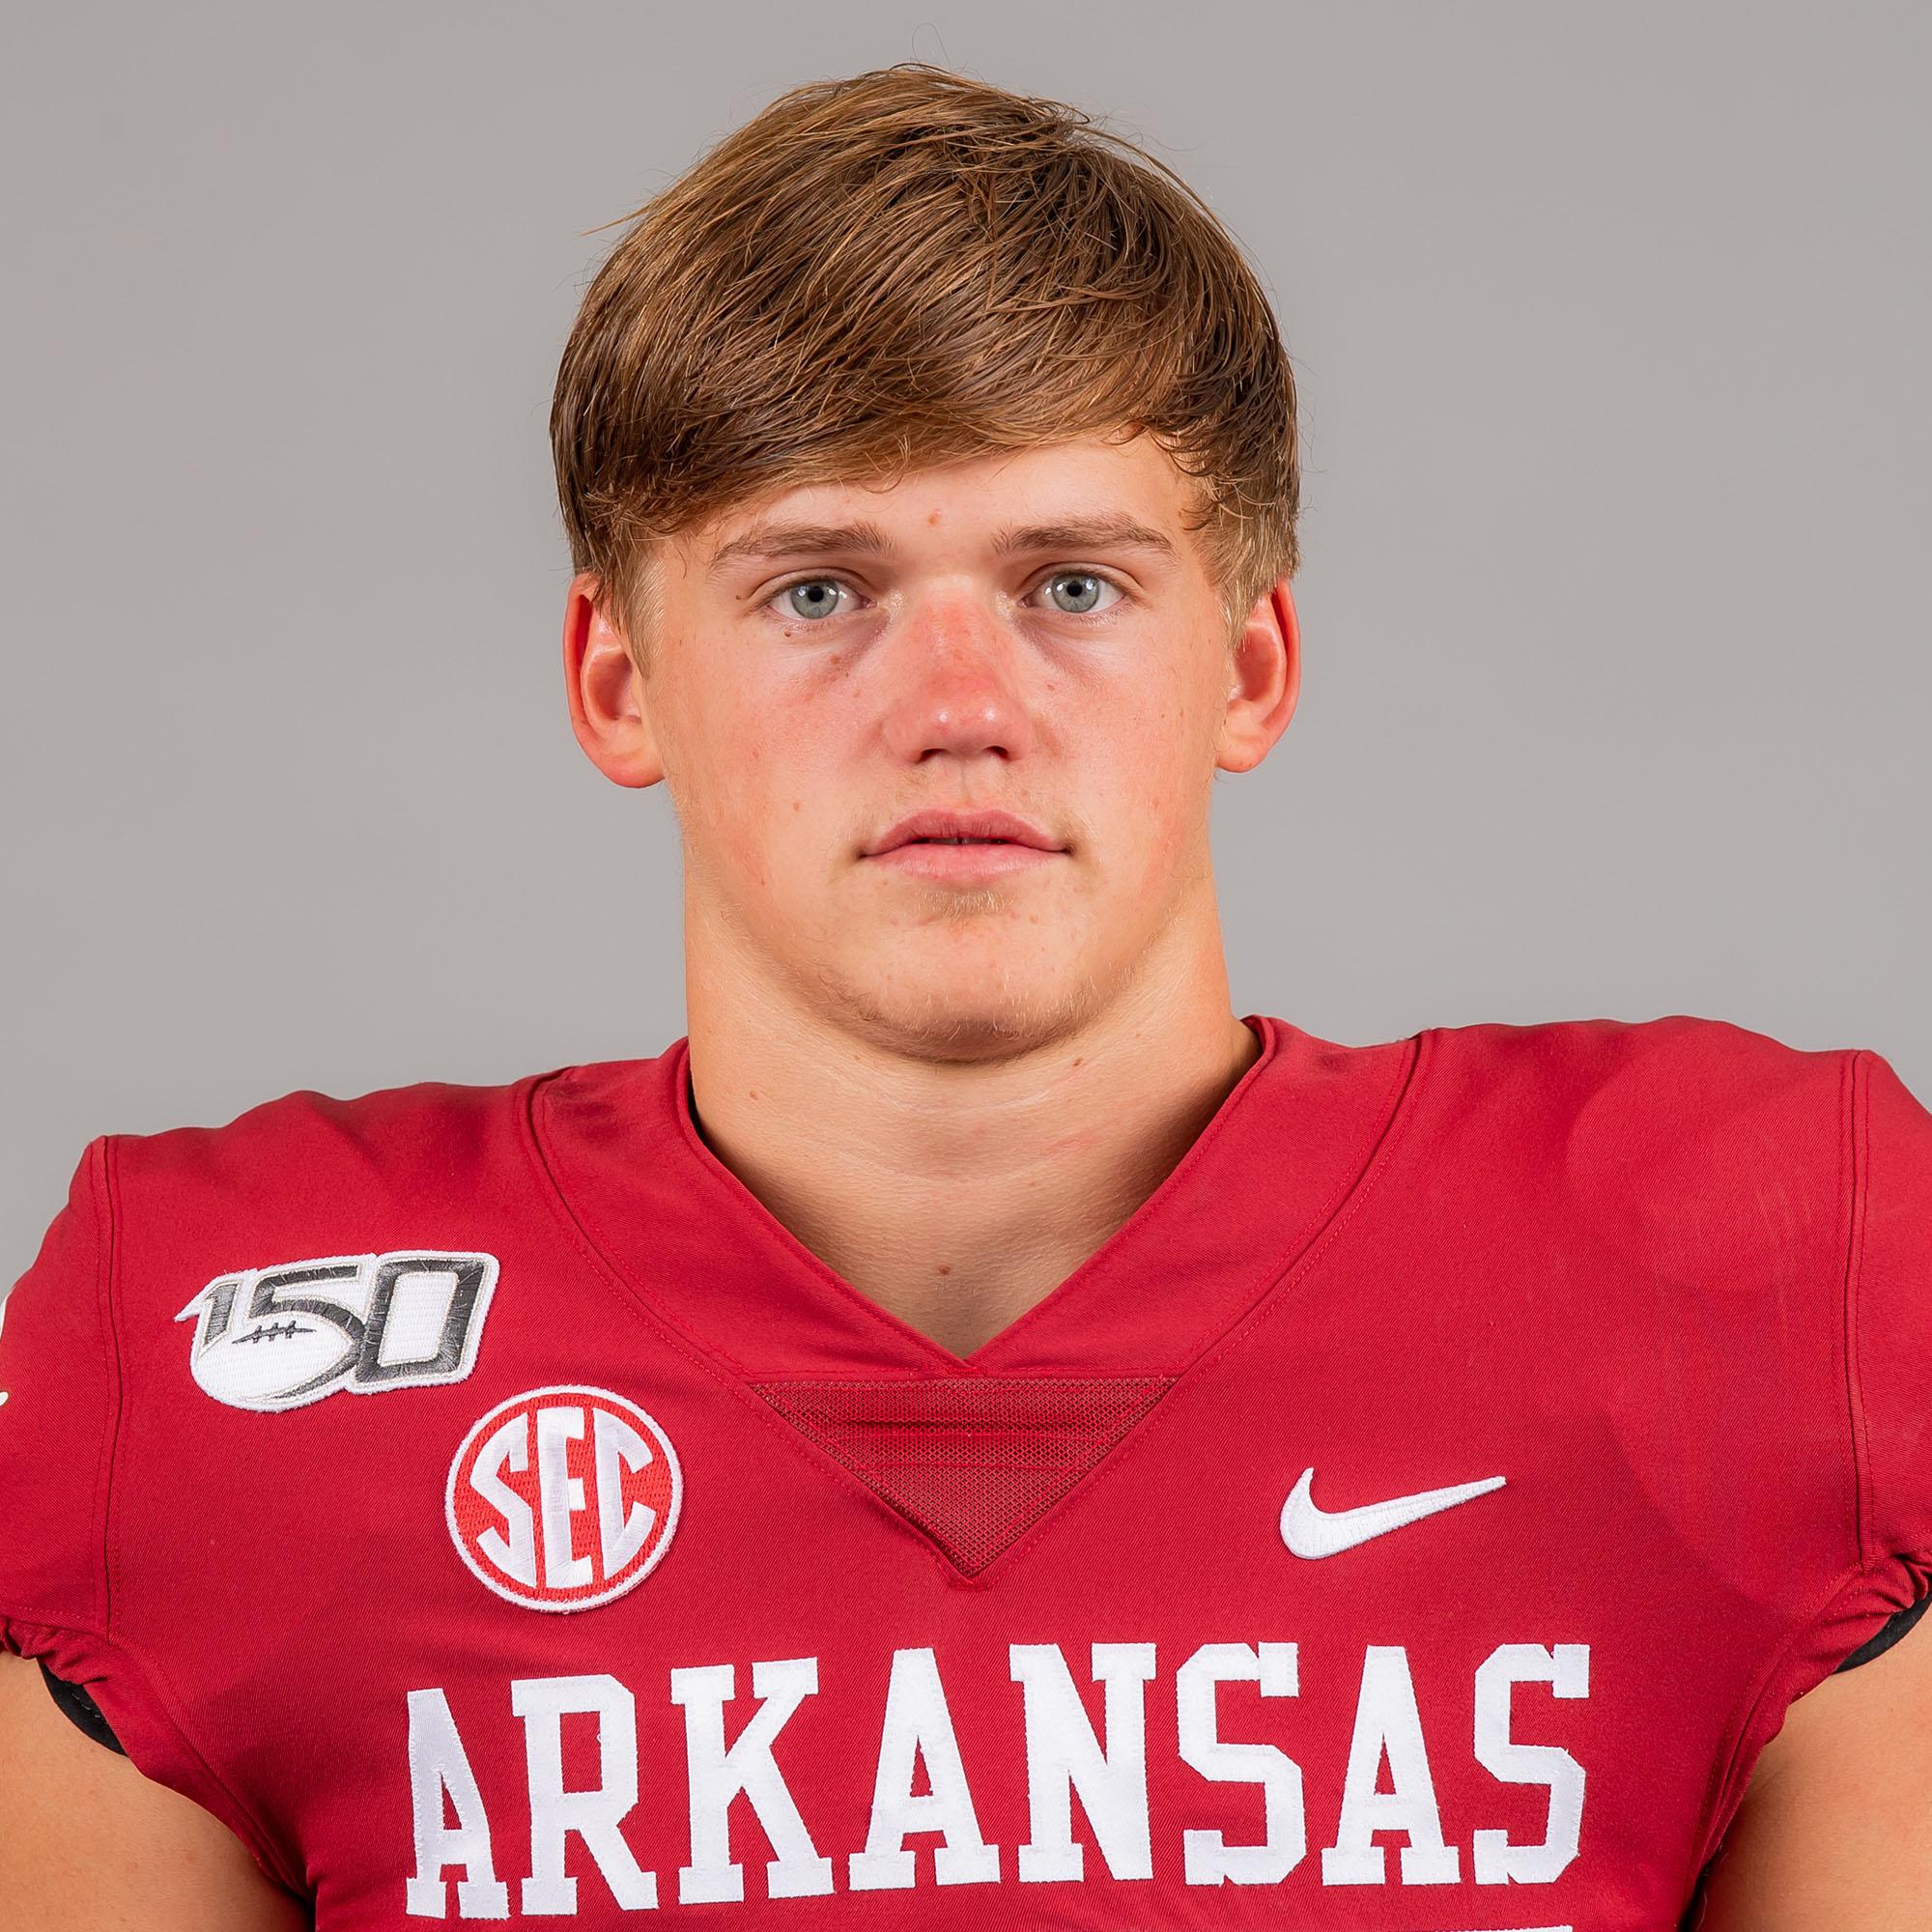 Jackson Woodard - Football - Arkansas Razorbacks